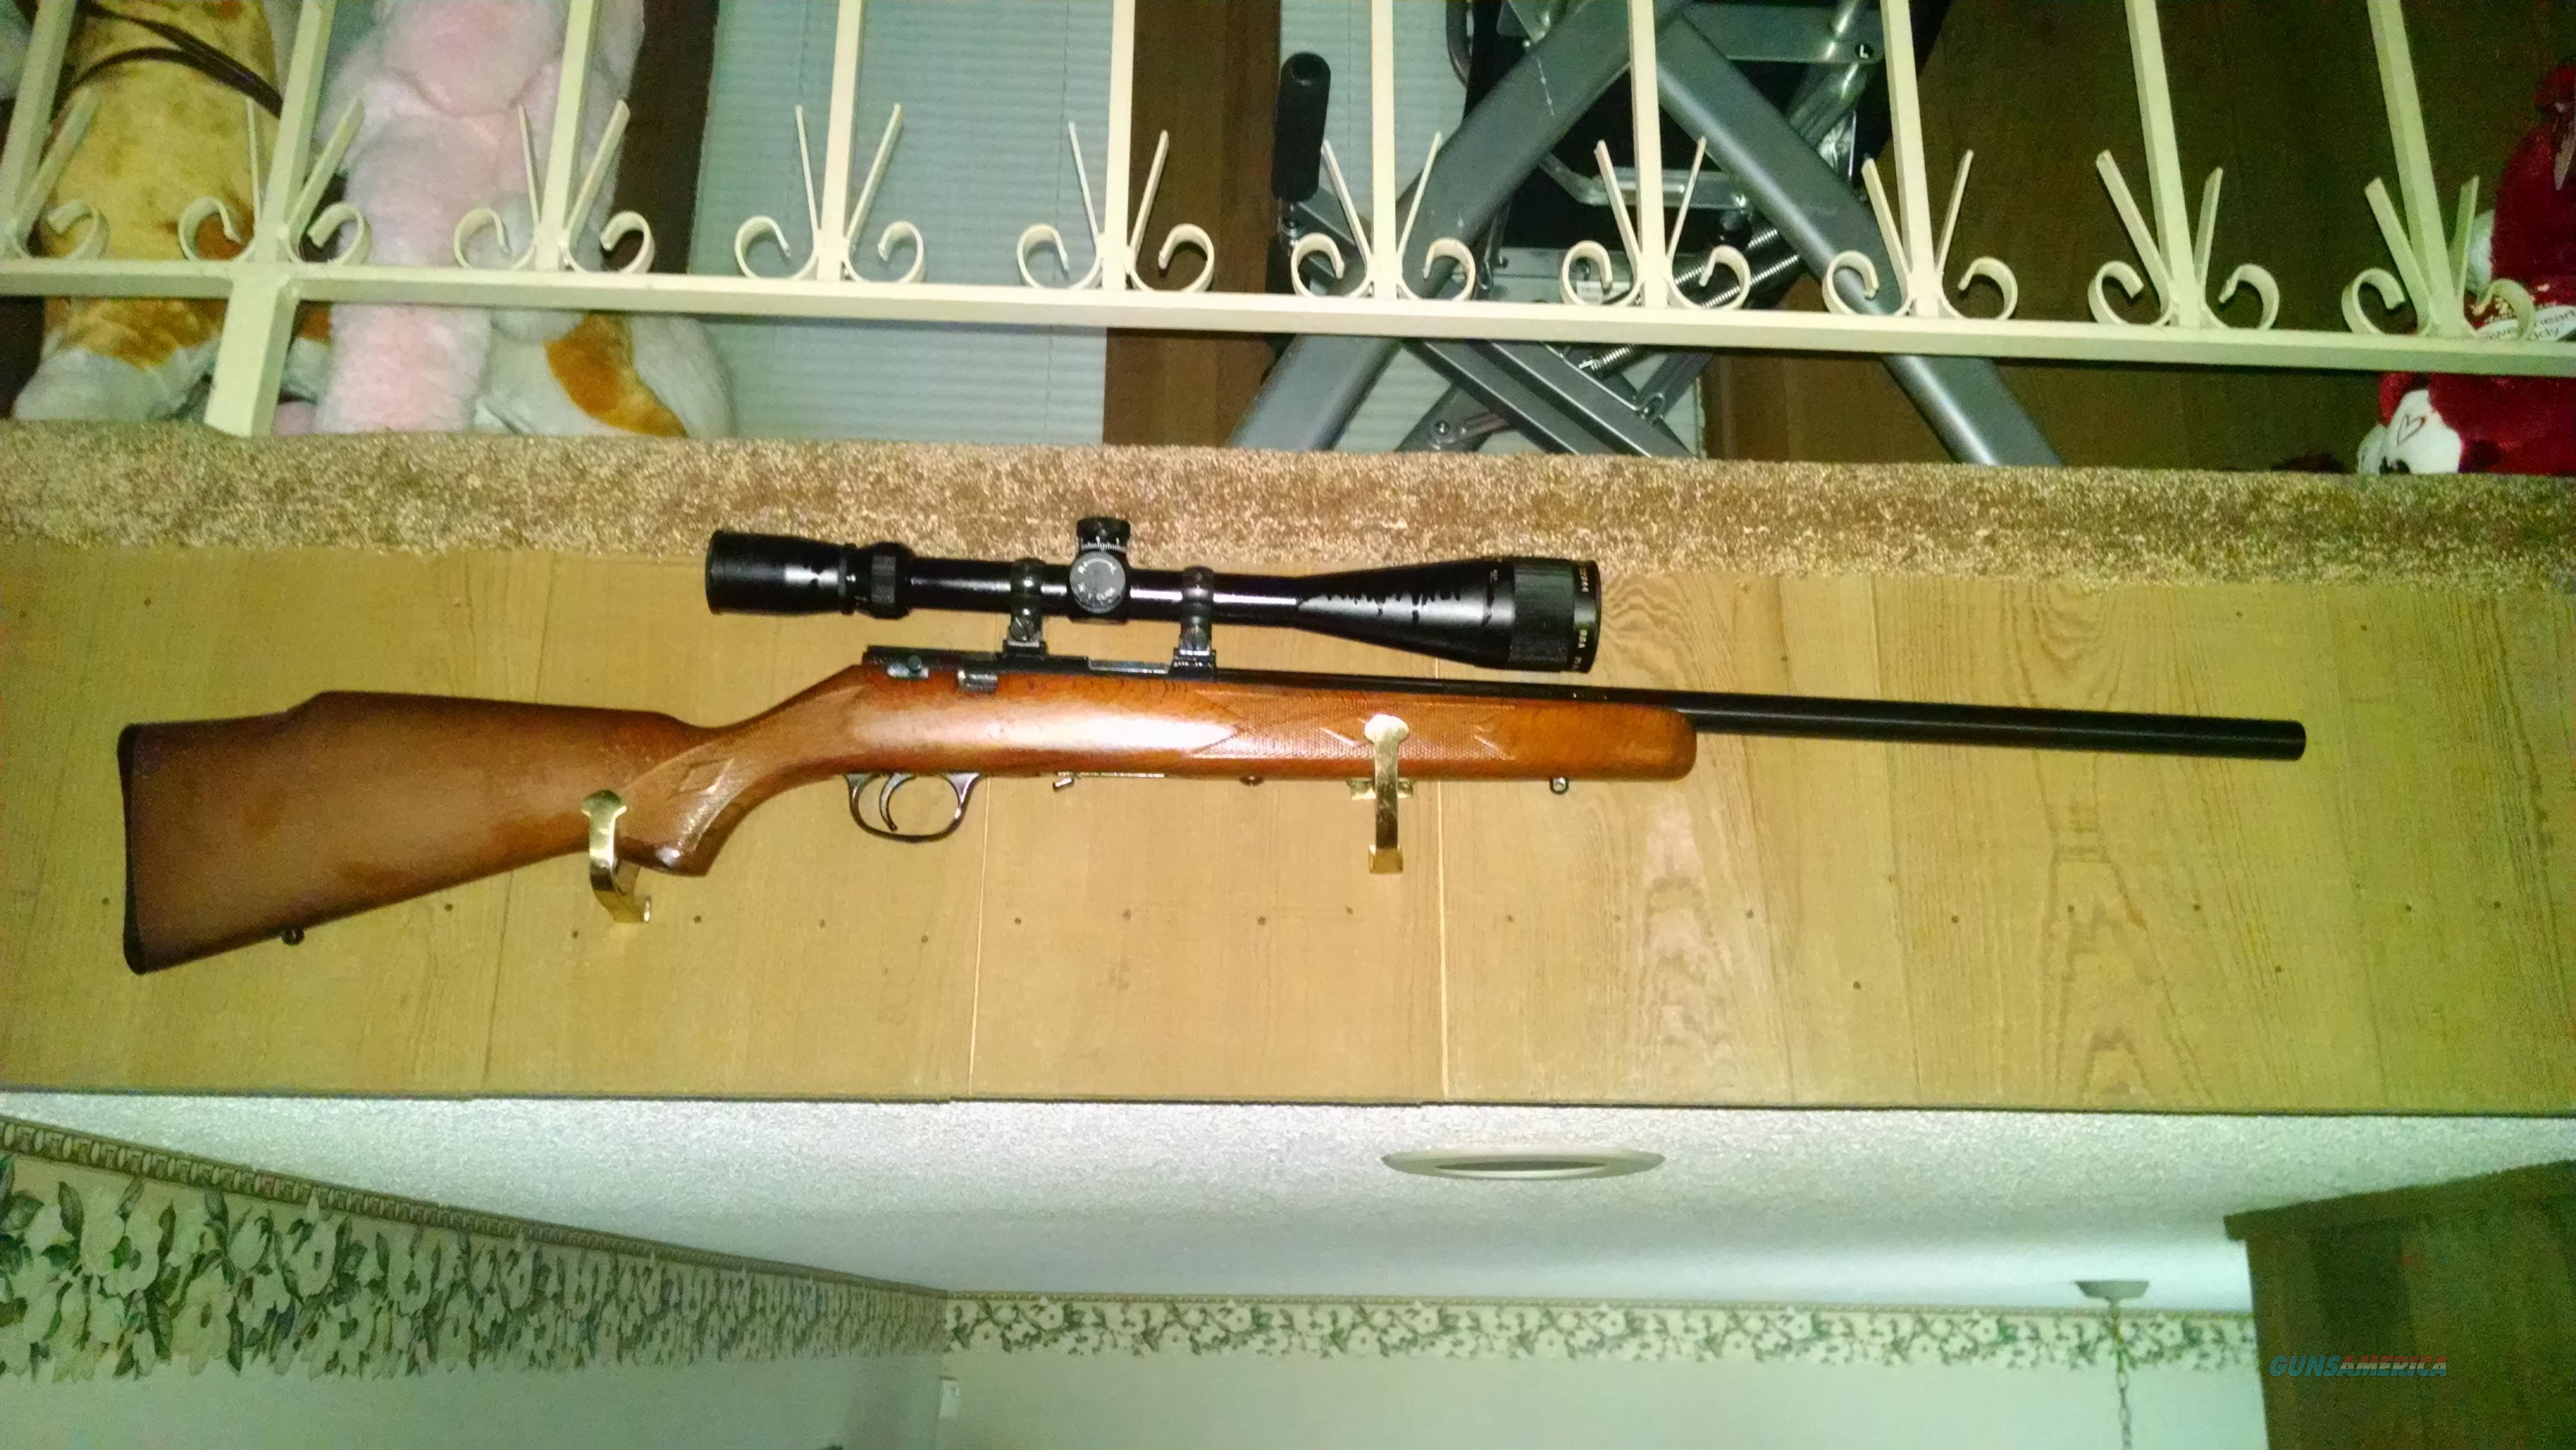 Marlin, 917V, 17HMR  Guns > Rifles > Marlin Rifles > Modern > Bolt/Pump